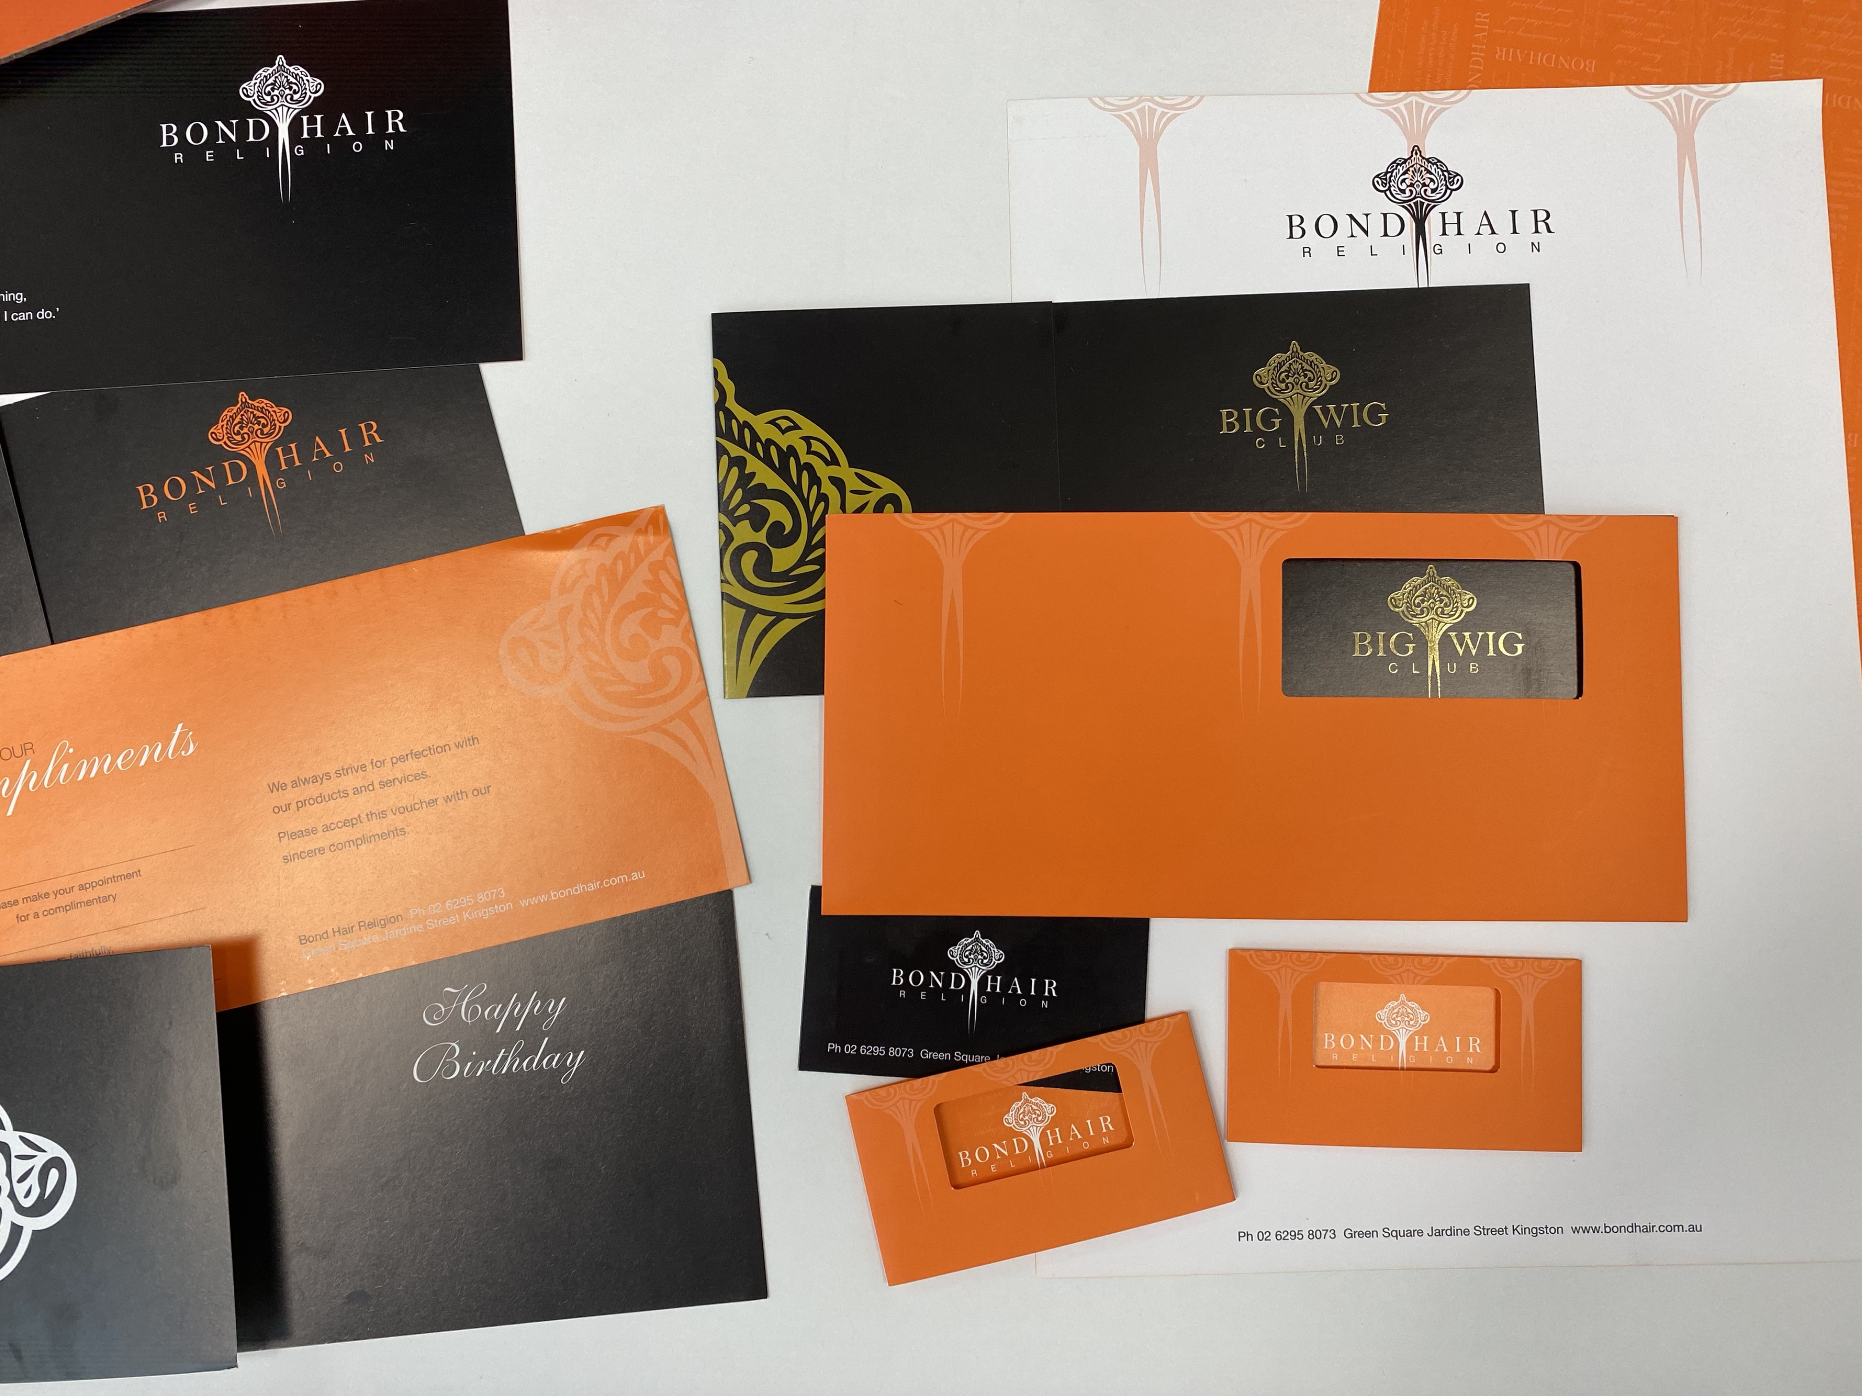 Bond Hair Religion Promotional Print Items